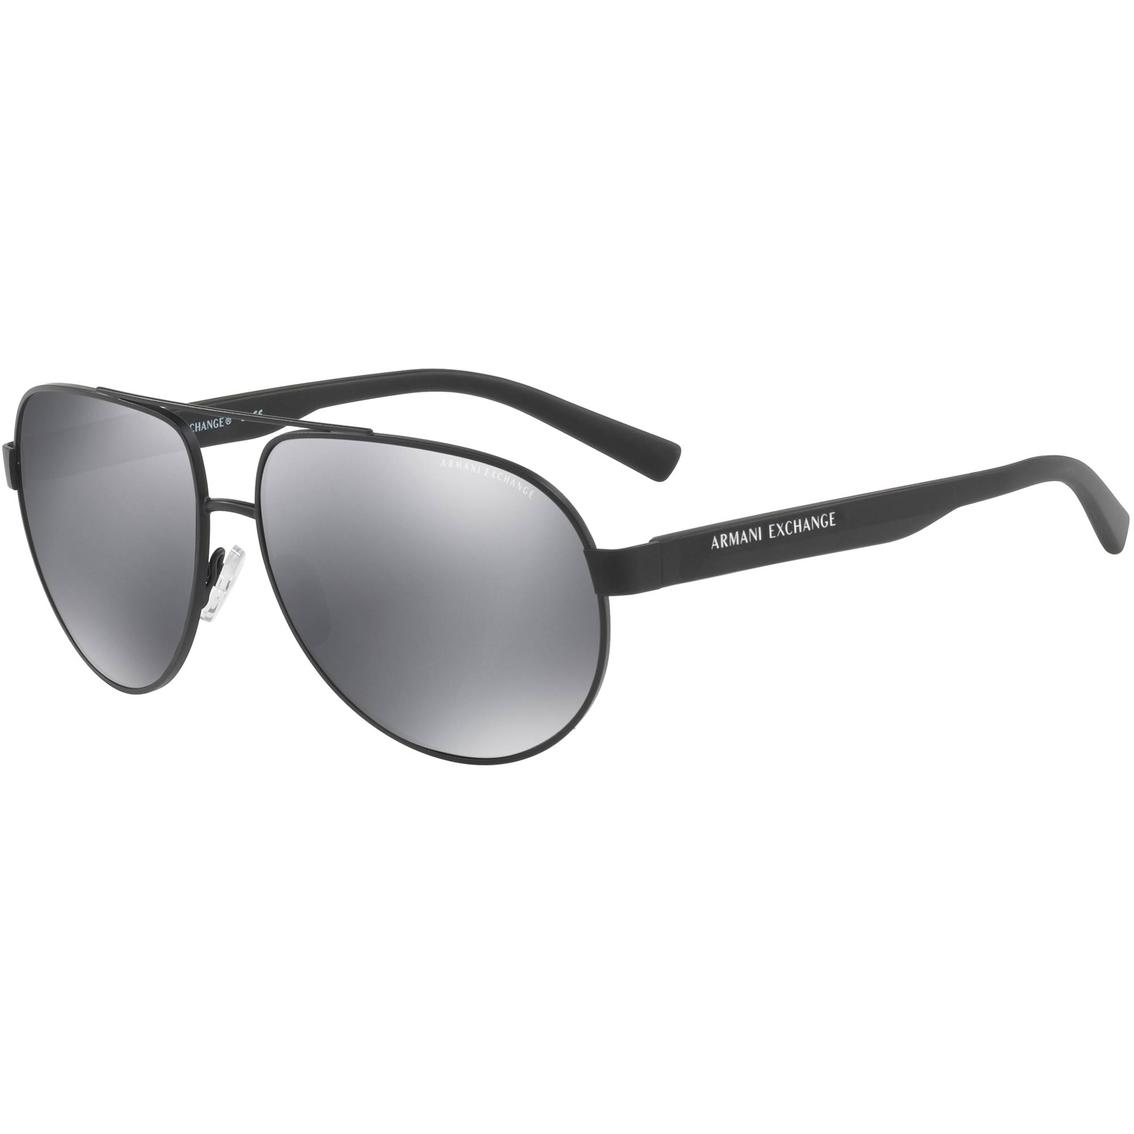 f1b5e5f25 Armani Exchange Aviator Sunglasses 0ax2022 | Men's Sunglasses ...